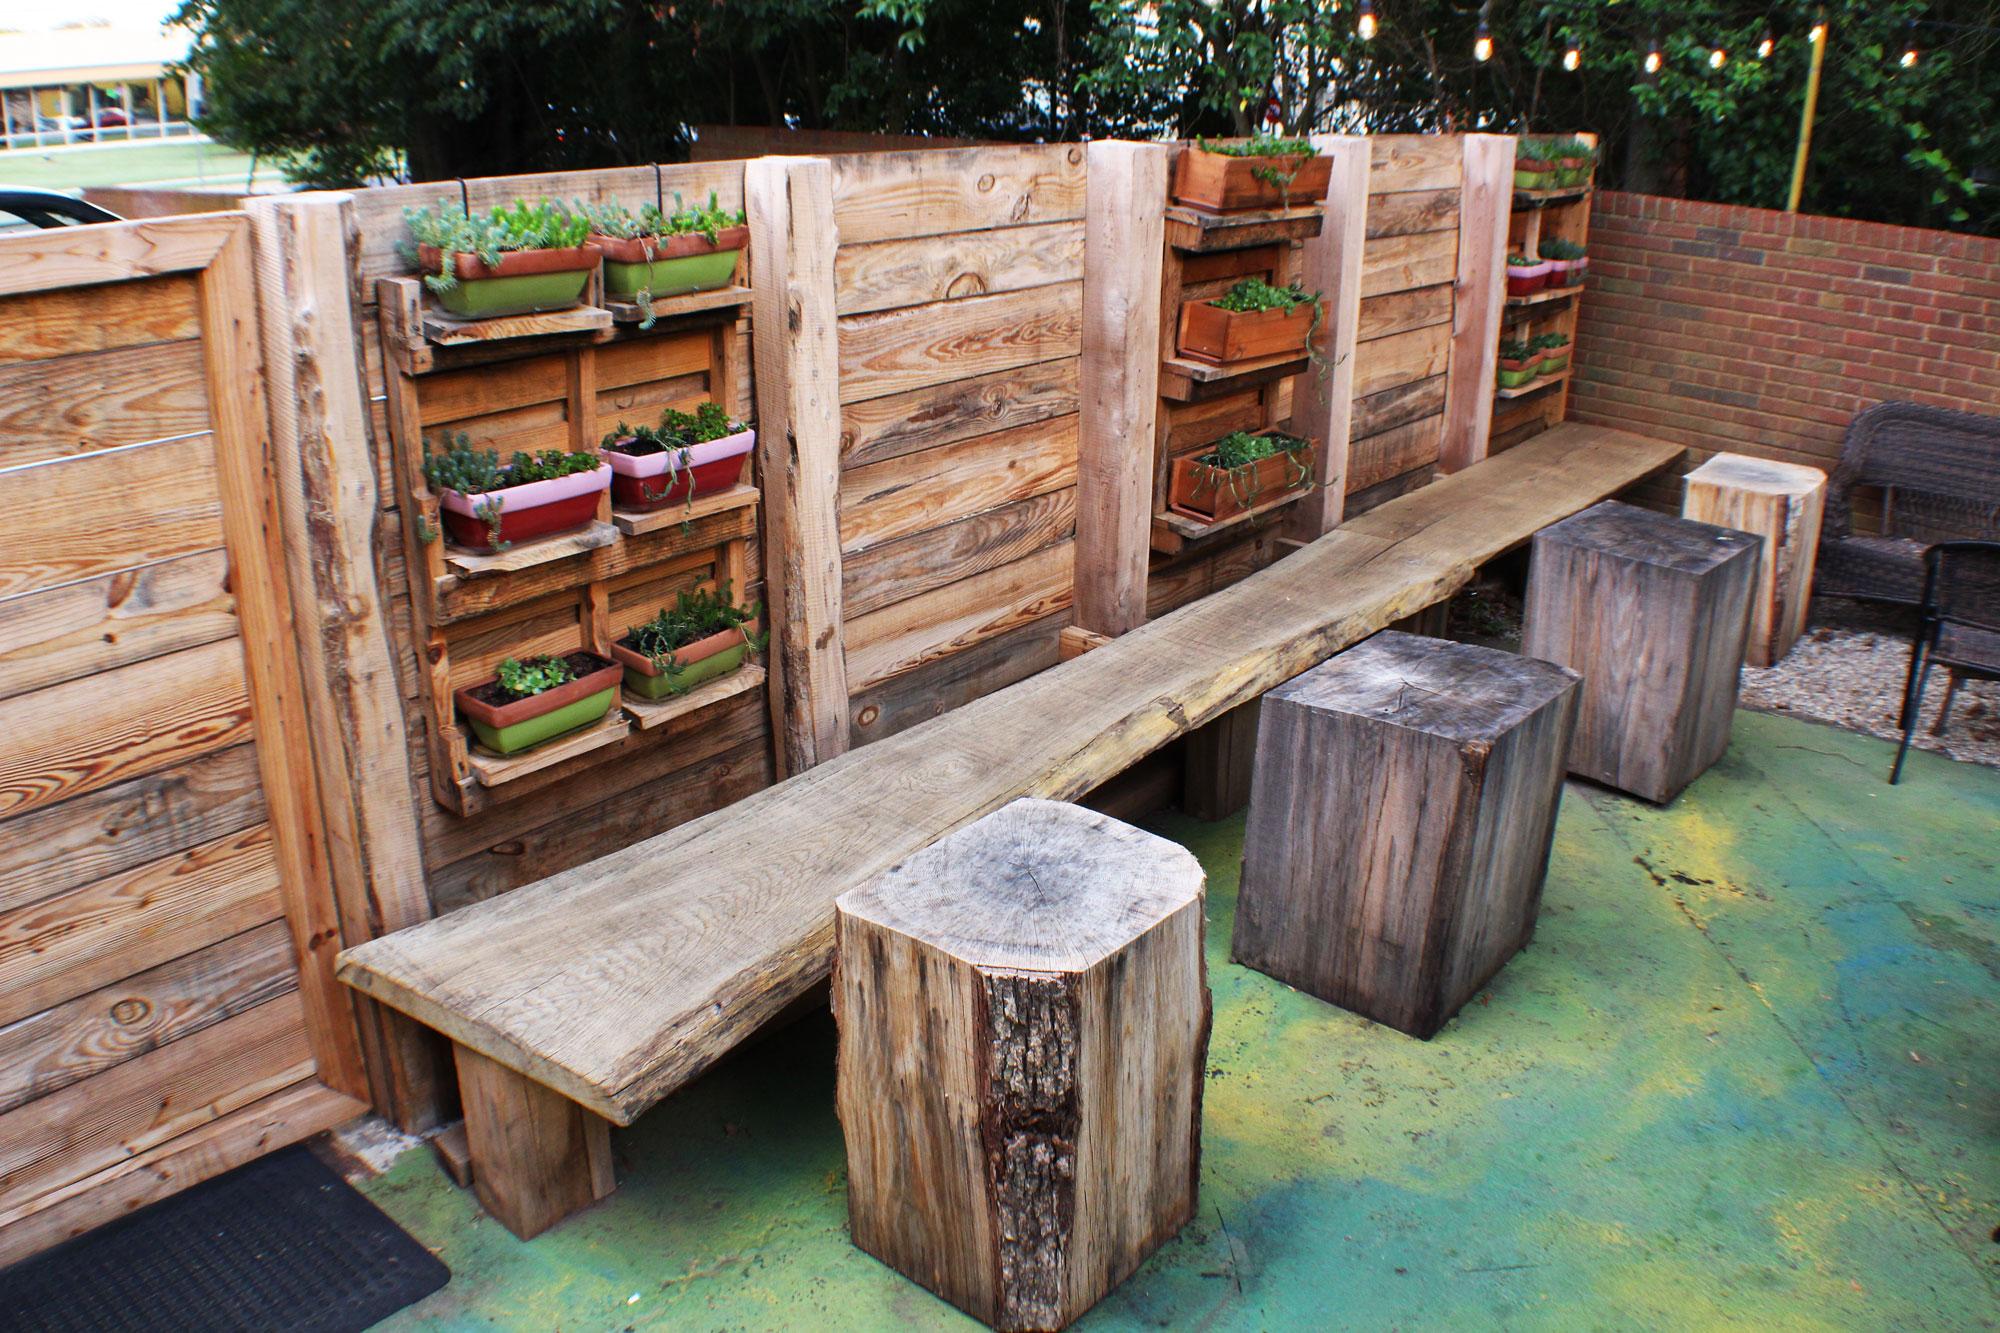 pasta_provisions_park_patio_bench.jpg